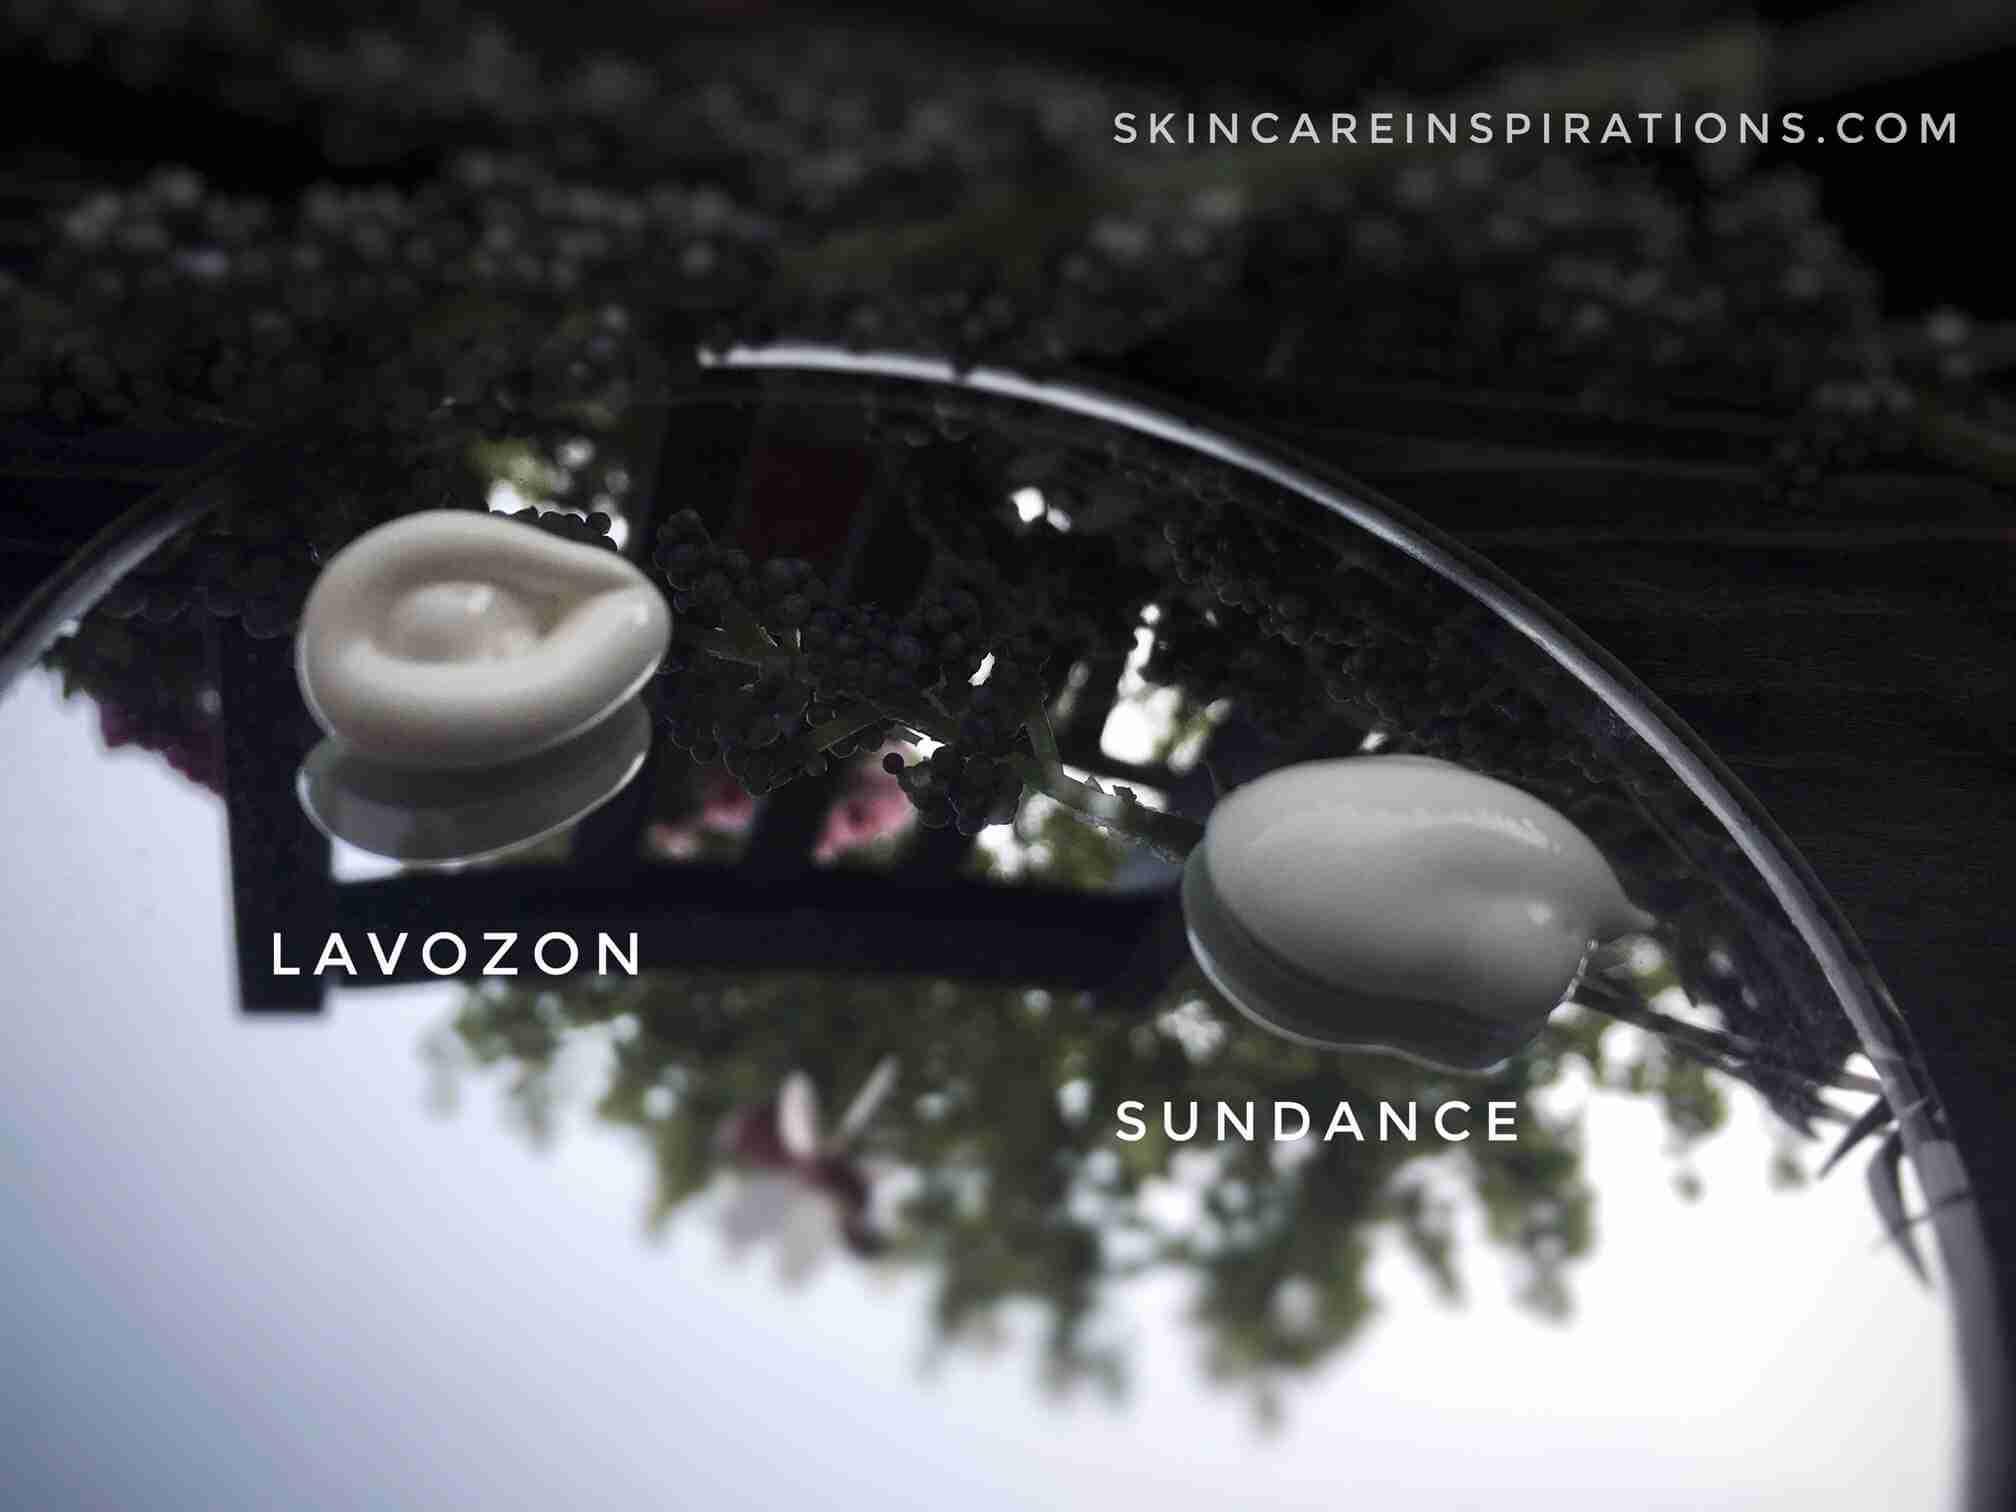 die beste Sonnencreme aus der Drogerie Lavozon Konsistenz